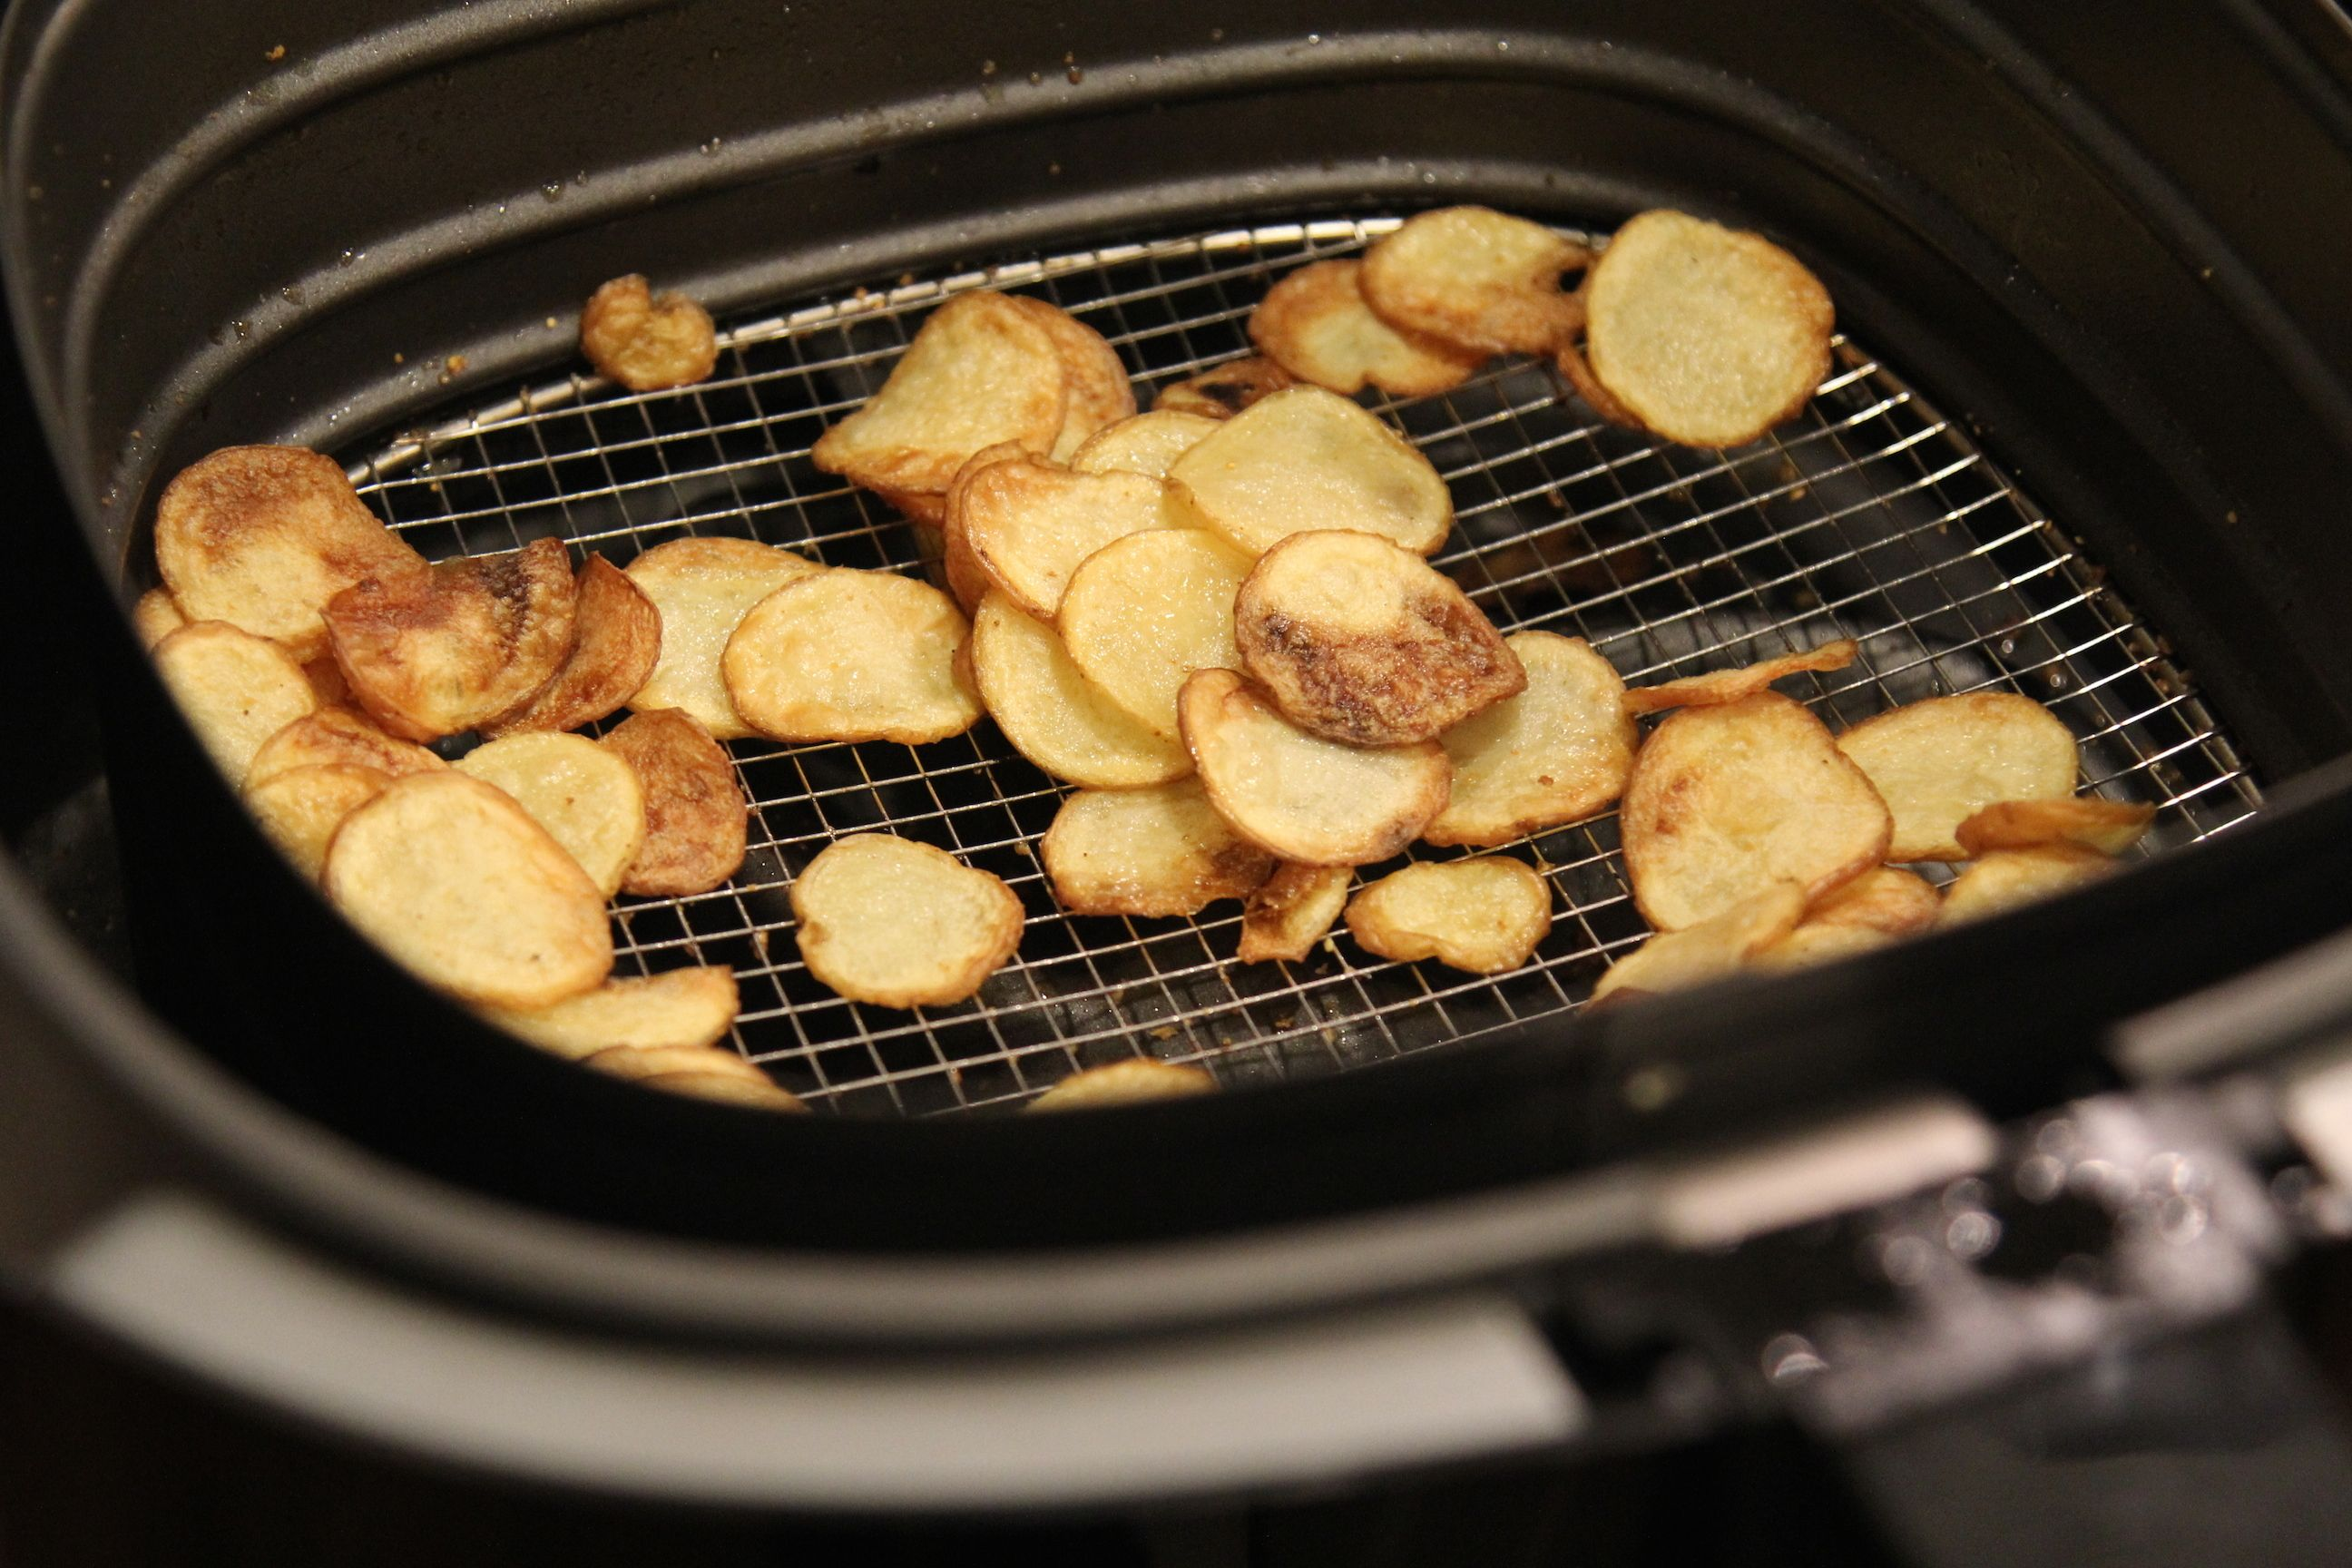 Salt and Vinegar AirFryer Potato Chips De Nigris Air